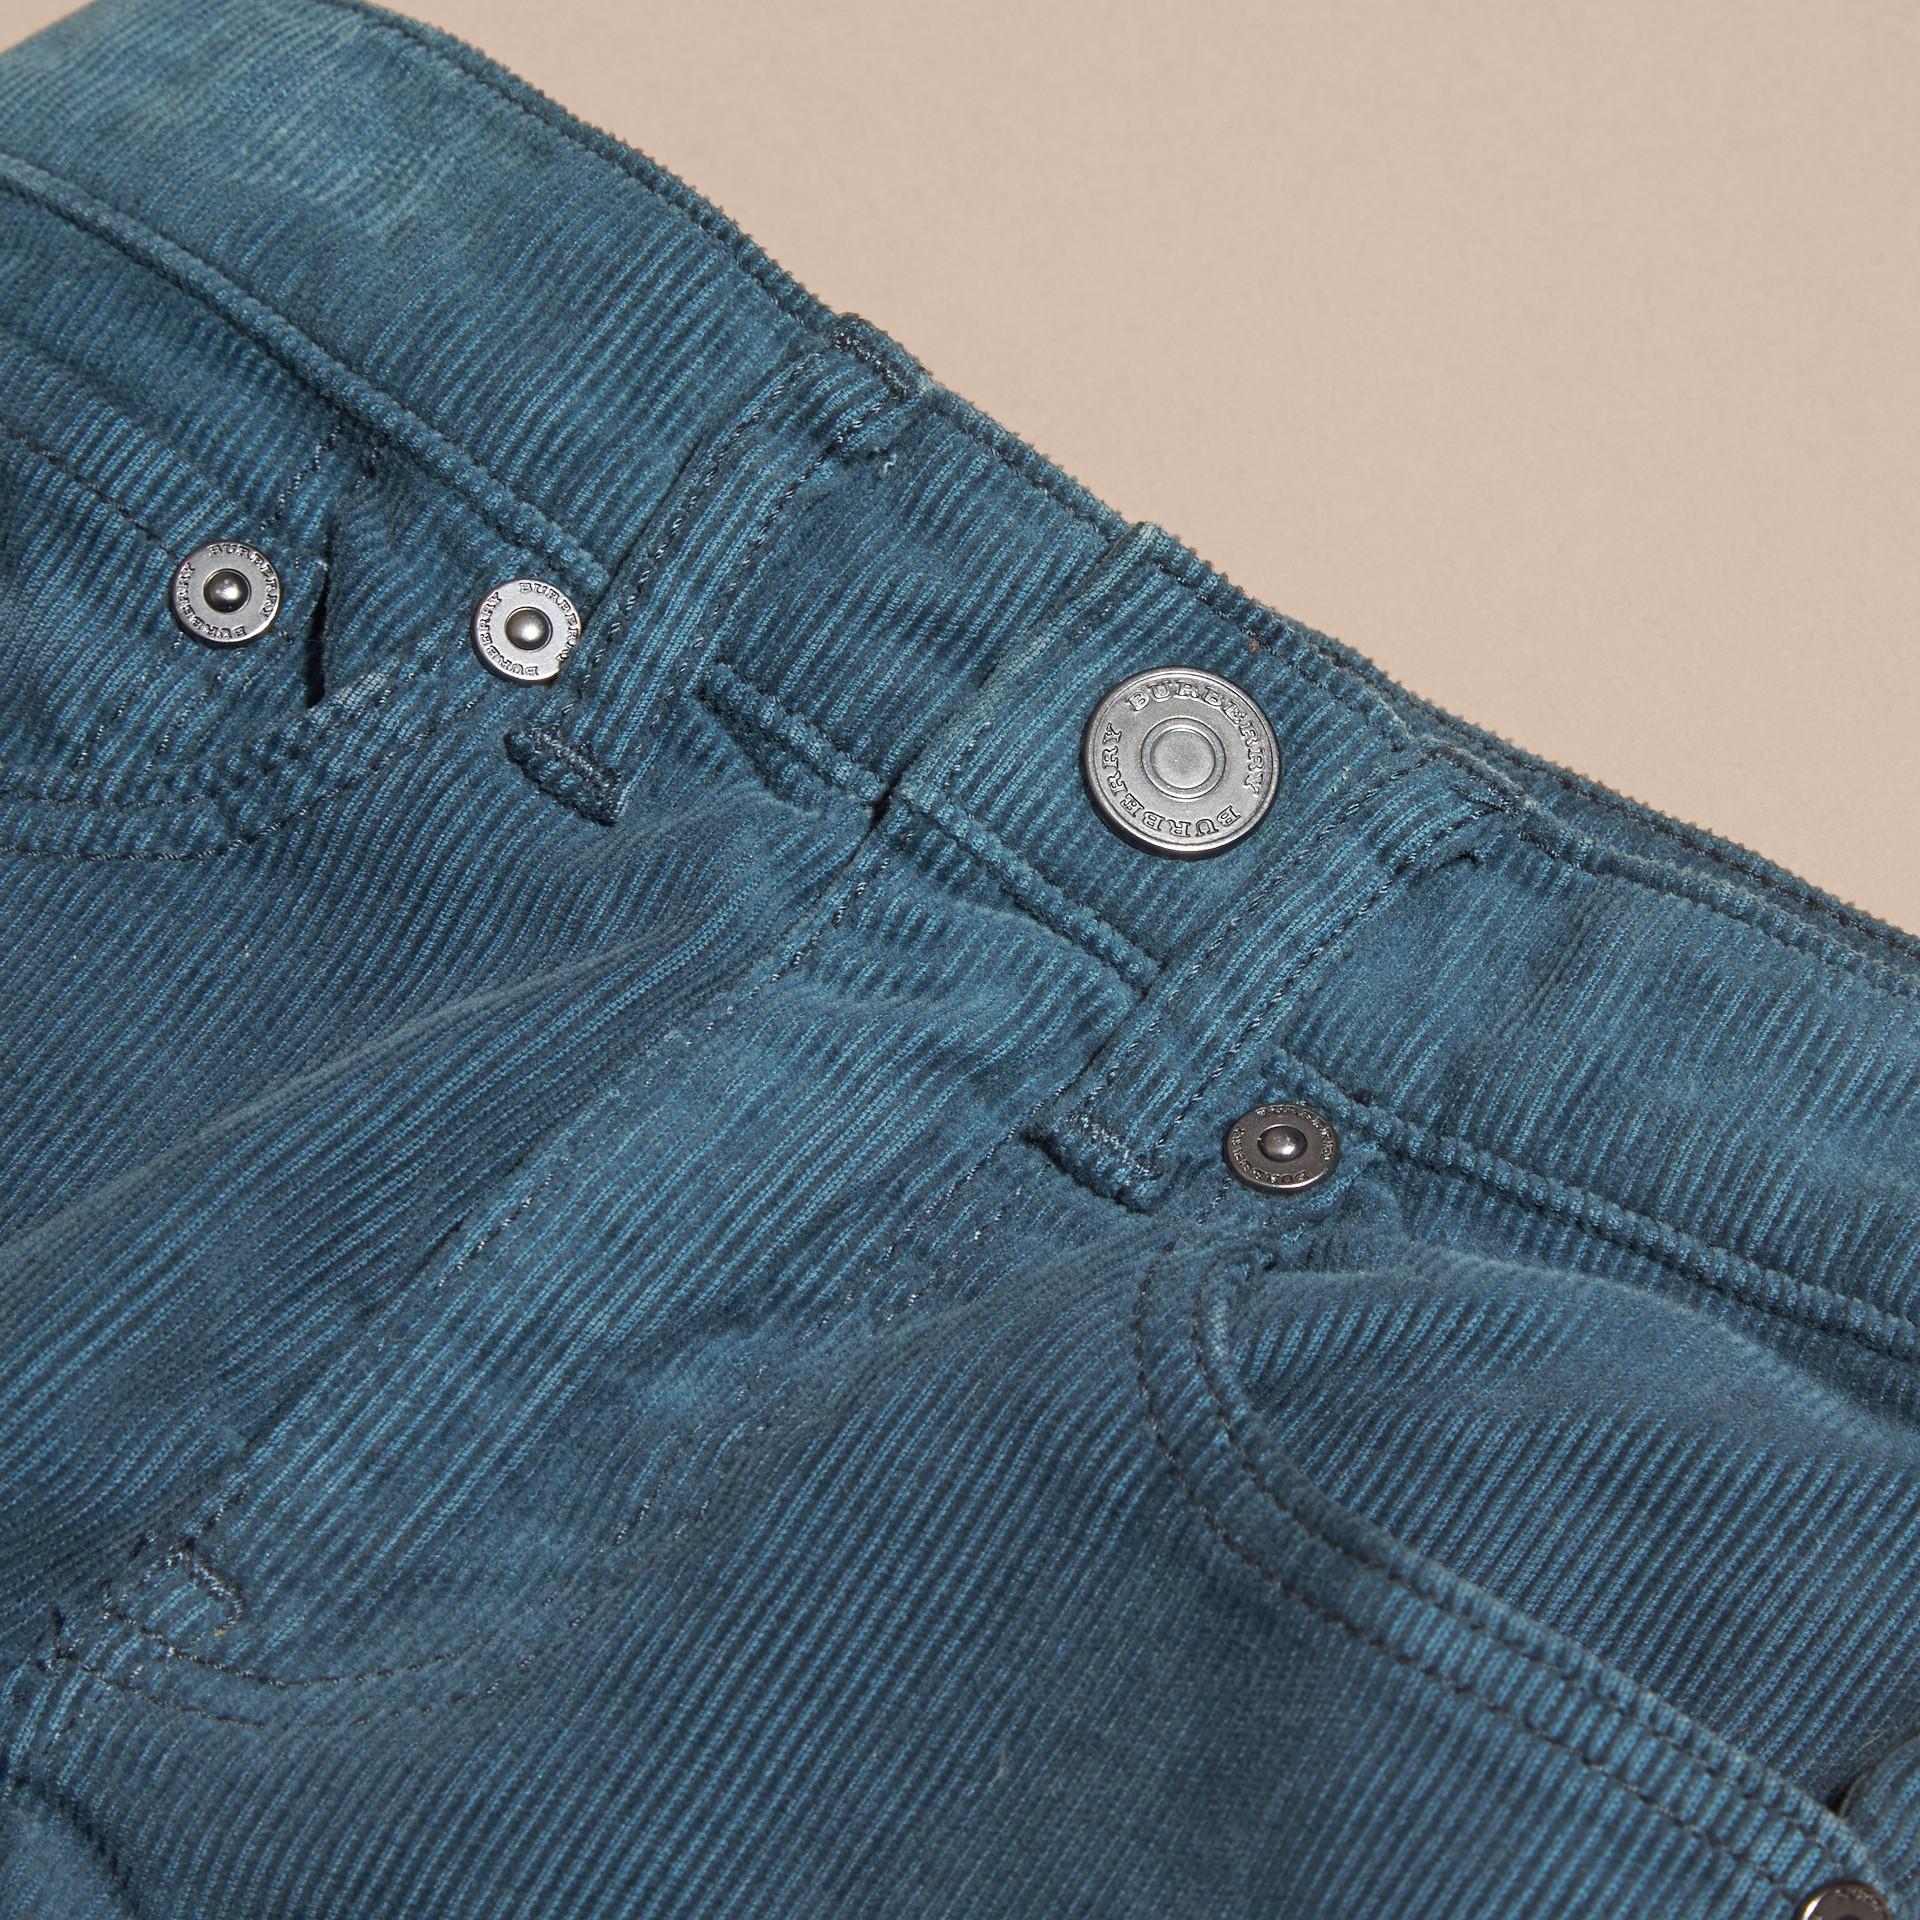 Blu minerale Jeans in corduroy stretch Blu Minerale - immagine della galleria 2